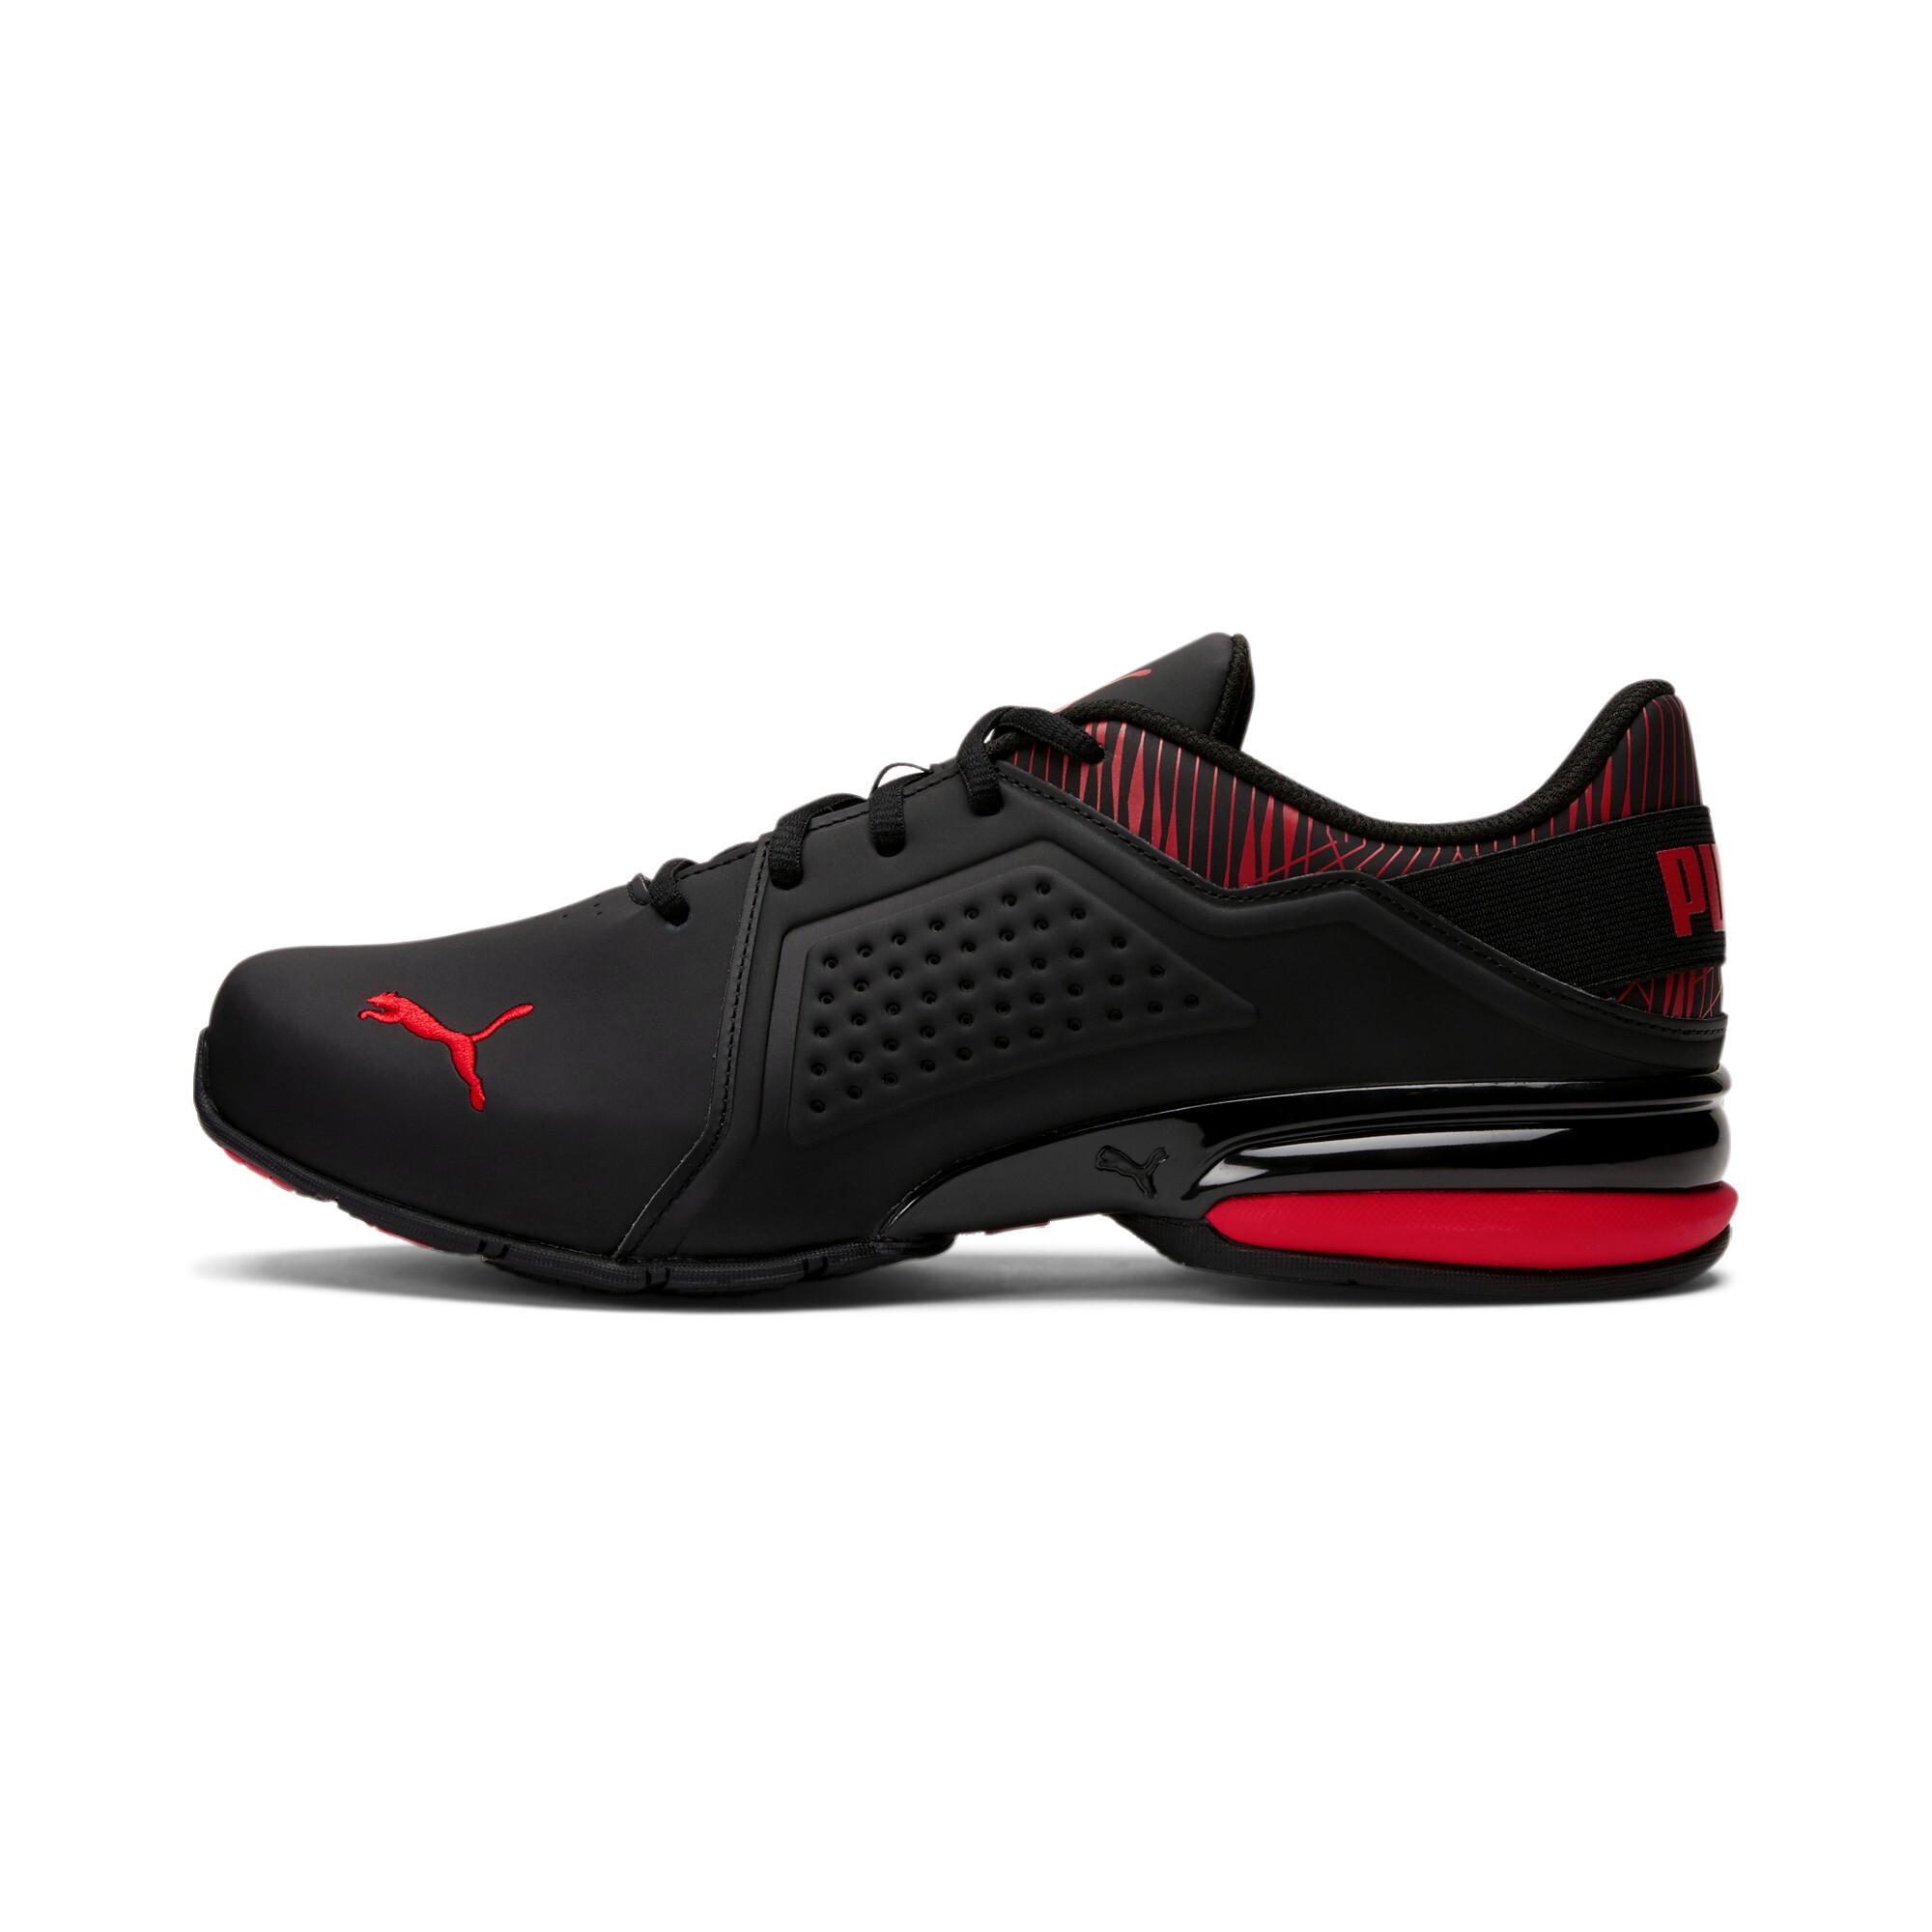 PUMA-Men-039-s-Viz-Runner-Graphic-Sneakers thumbnail 33